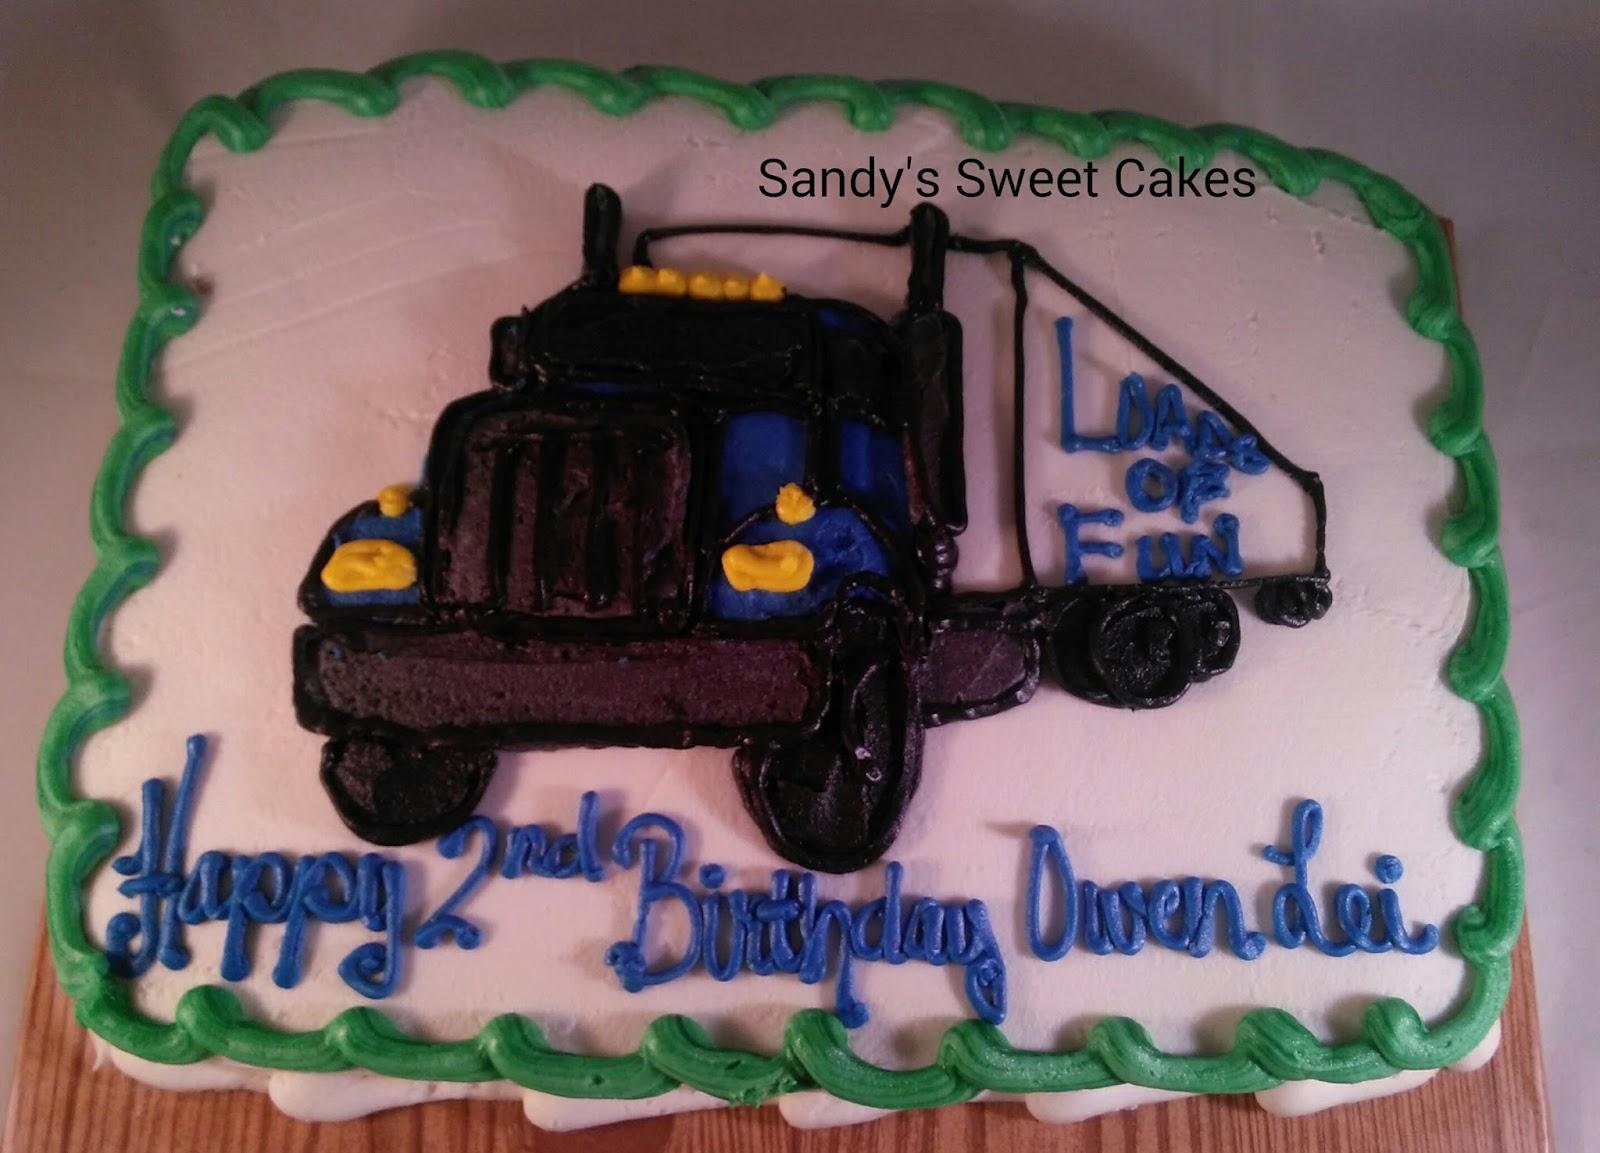 Sandys Sweet Cakes 18 wheeler tractor trailer cake